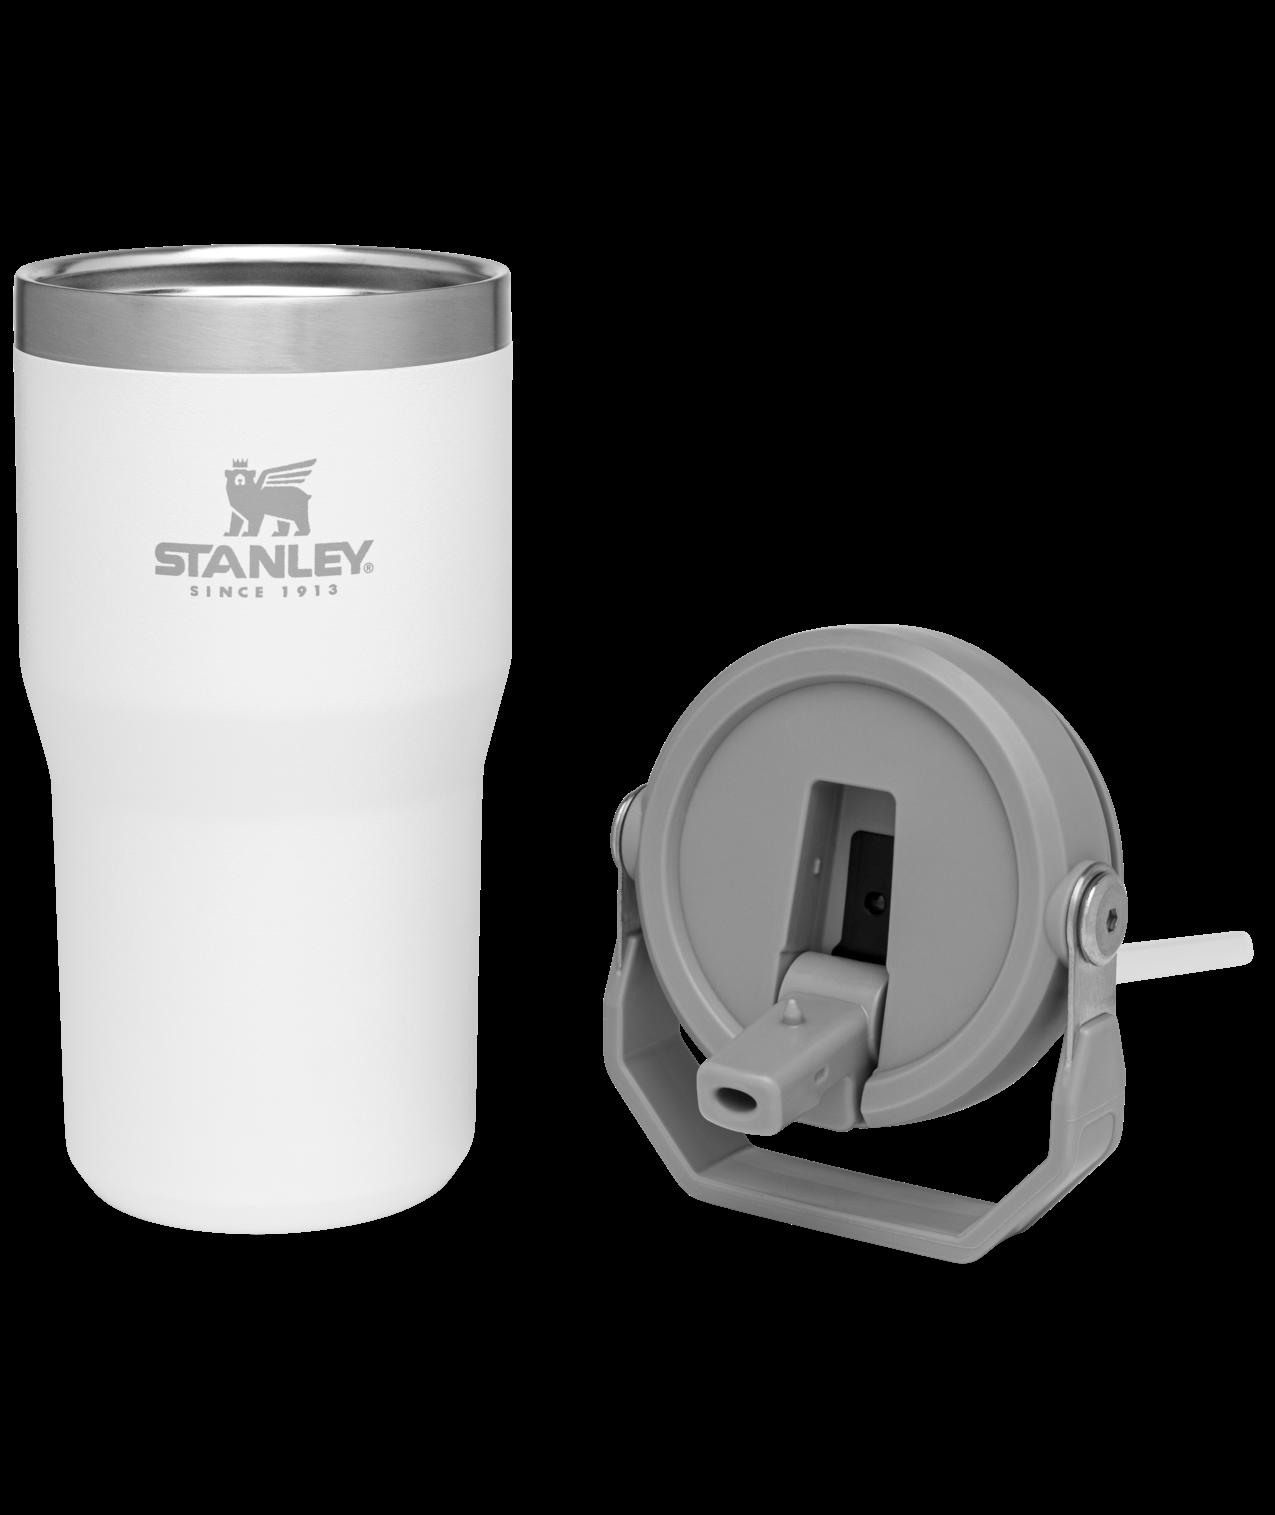 Bình Stanley Iceflow™ Flip Straw Tumbler | 20 oz - Màu Polar White